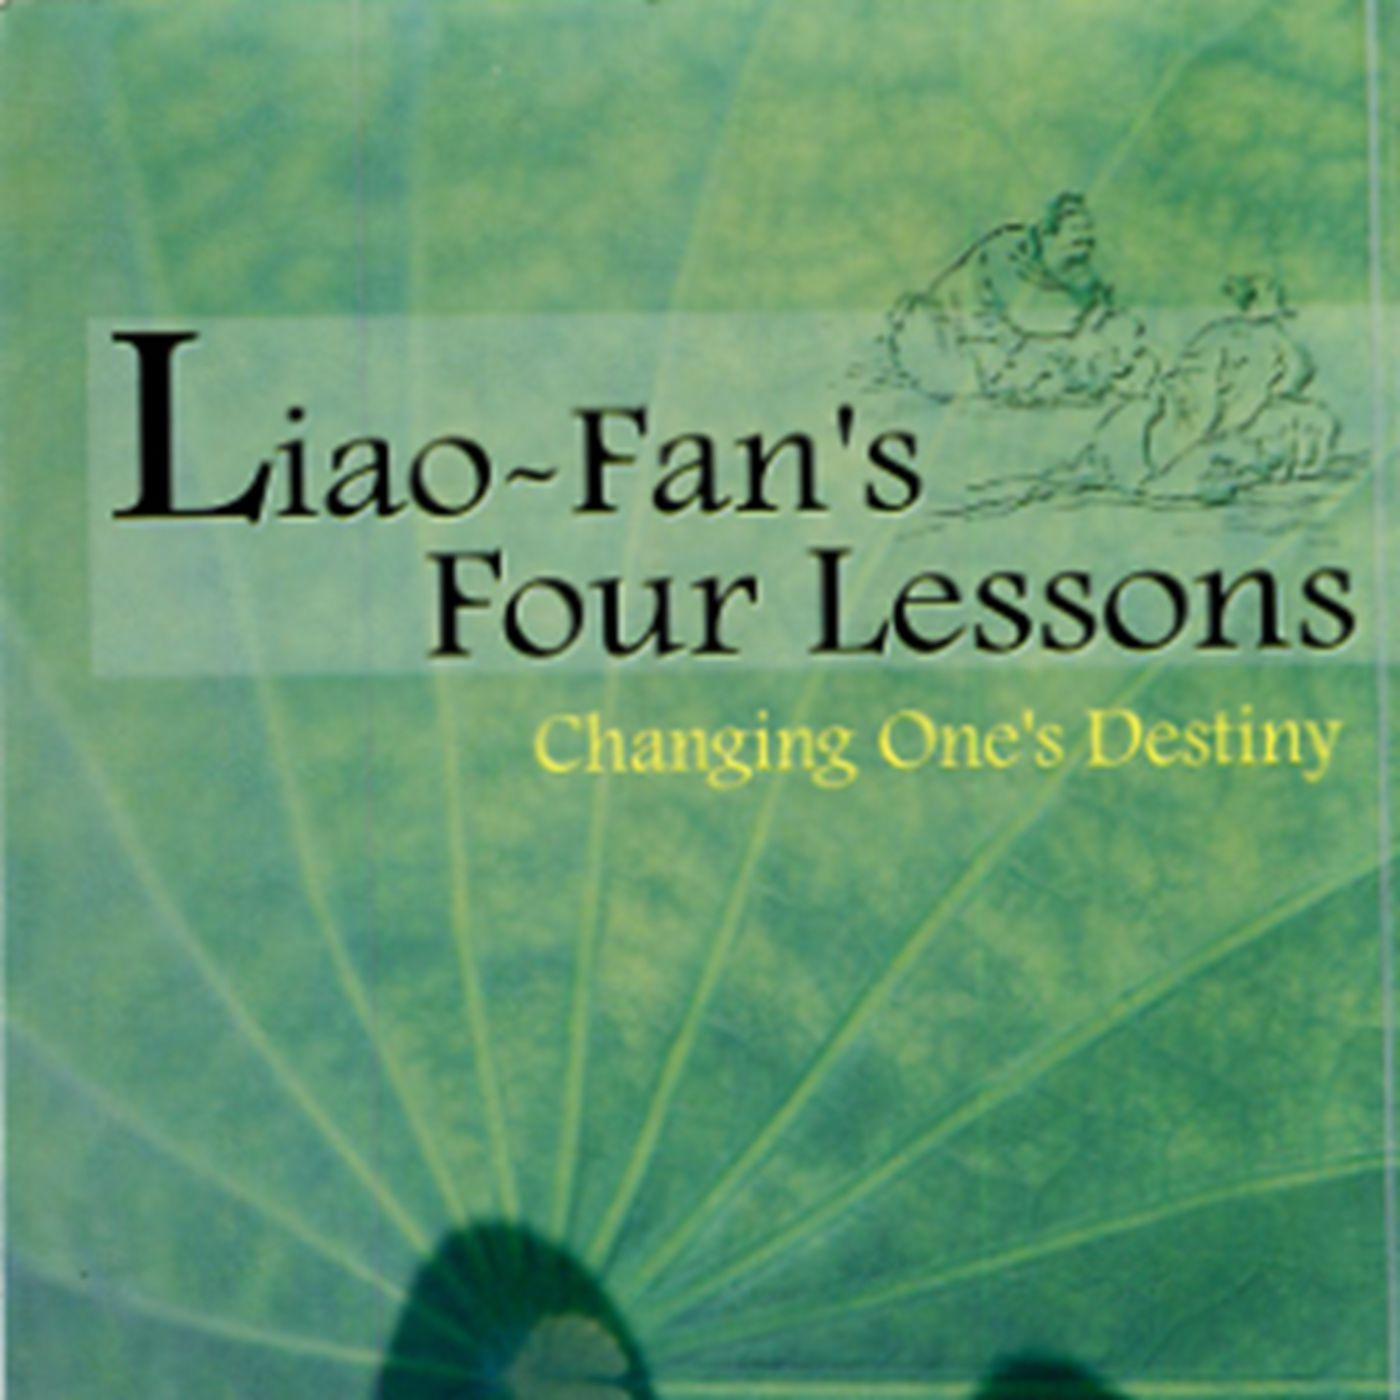 Liao-Fan's Four Lessons (了凡四訓英文有聲書)